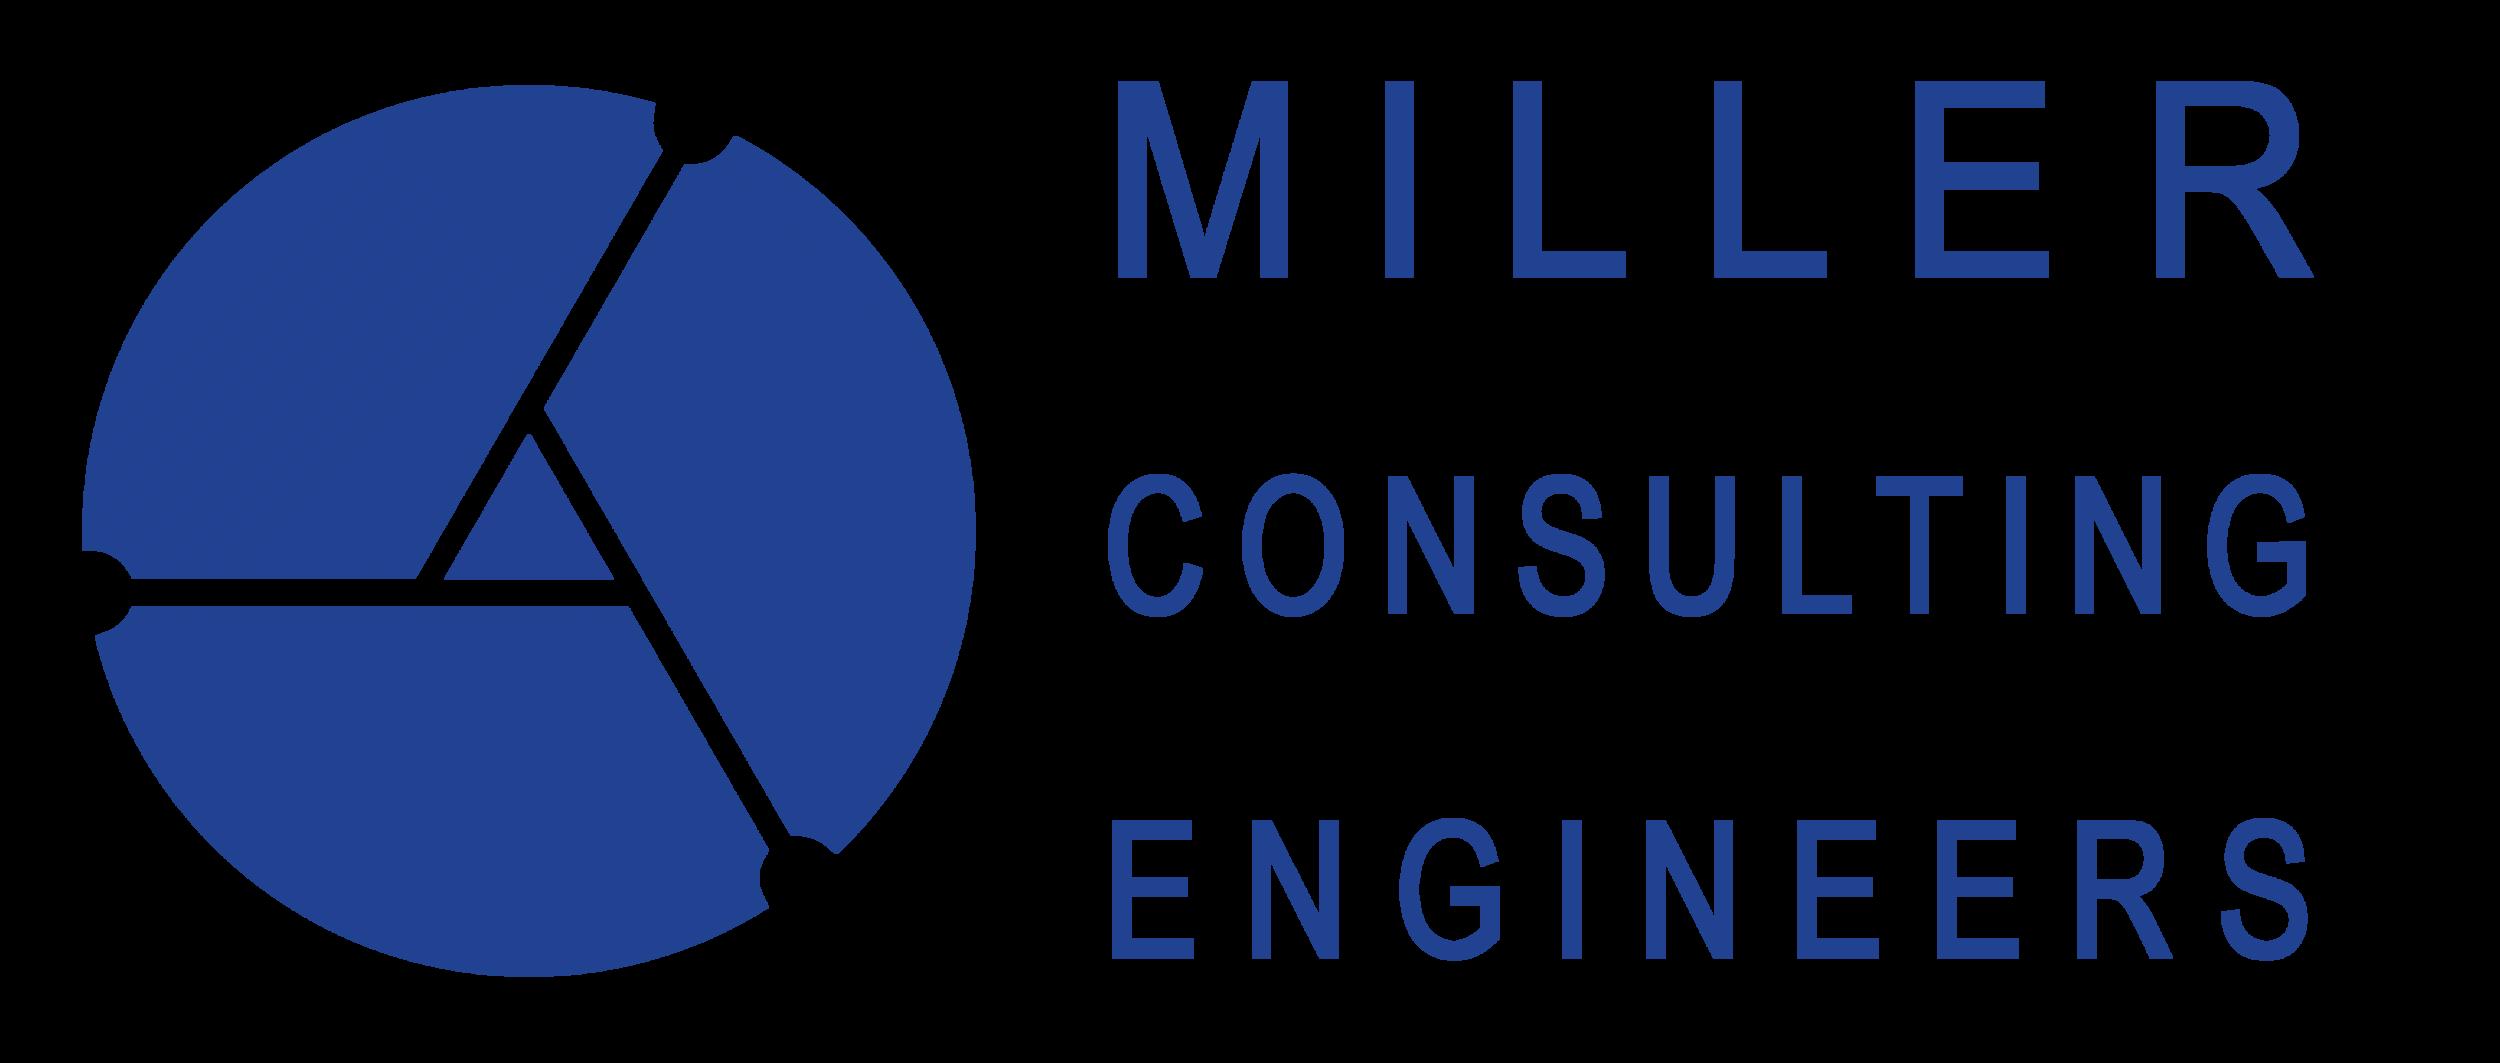 mce-logo-sample-3b-transparent-01_0.png